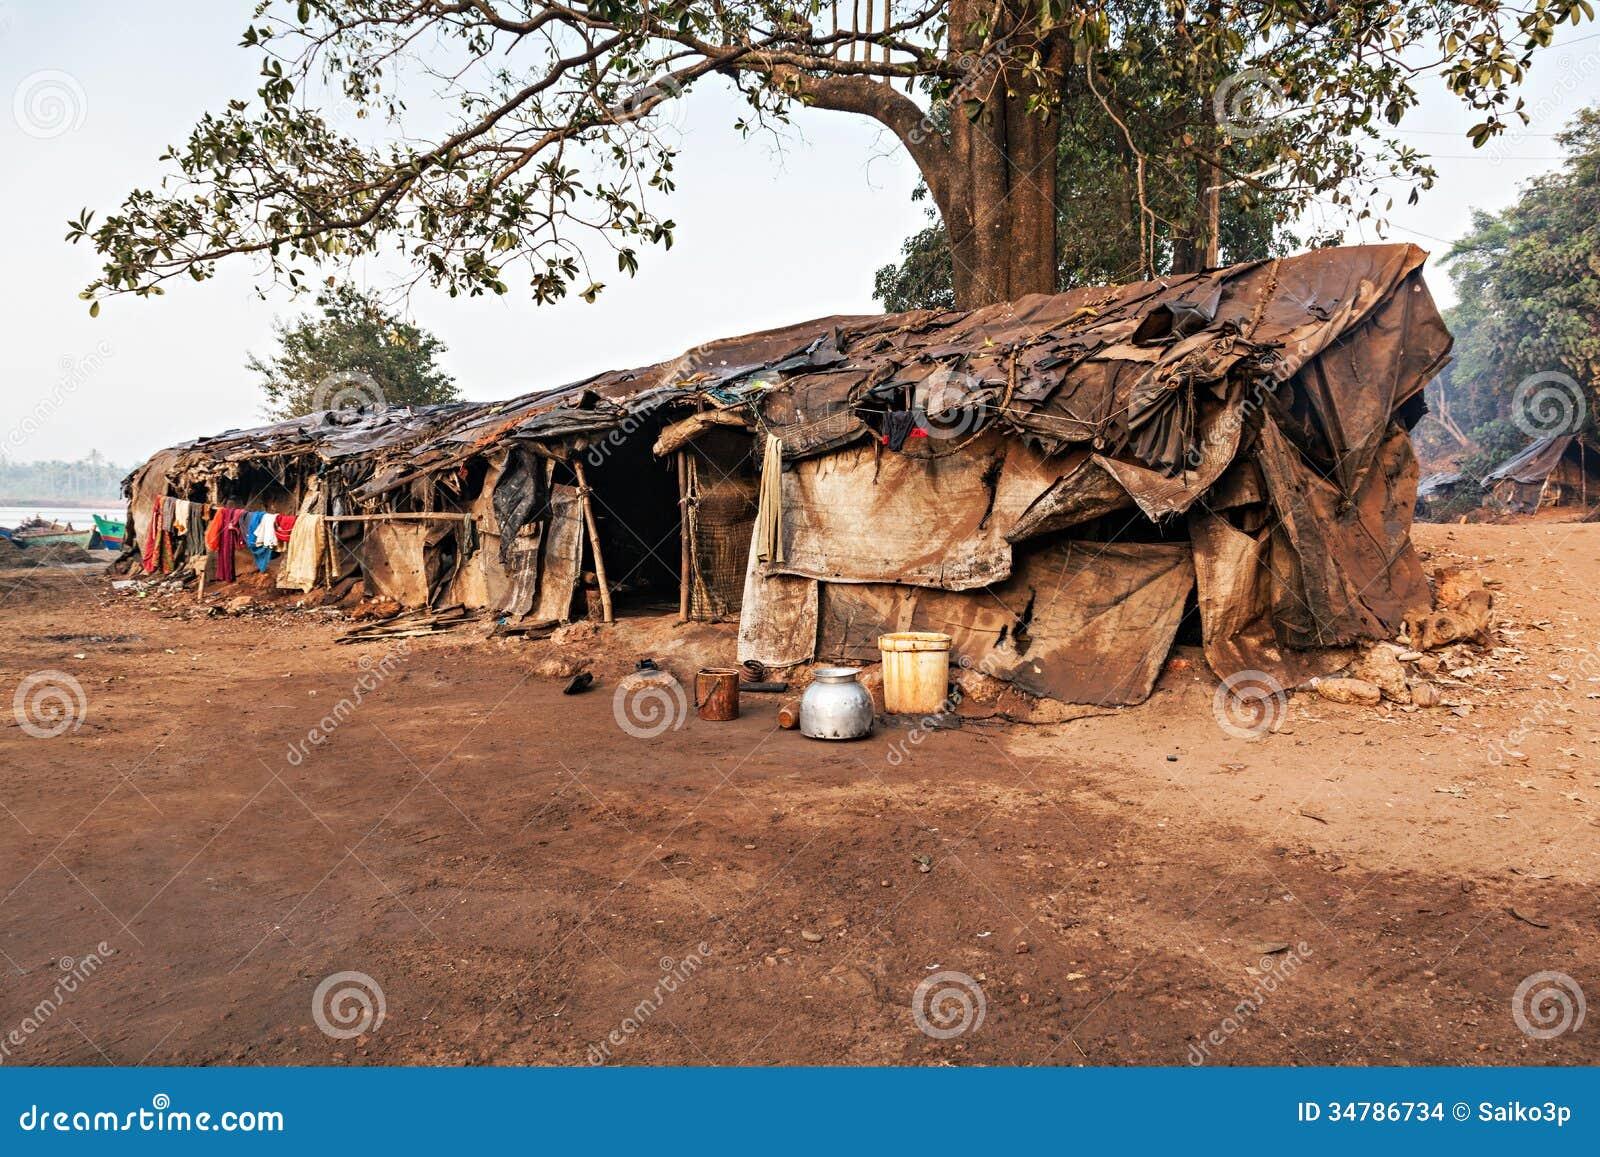 Dirt Street Stock >> Slum Stock Images - Image: 34786734